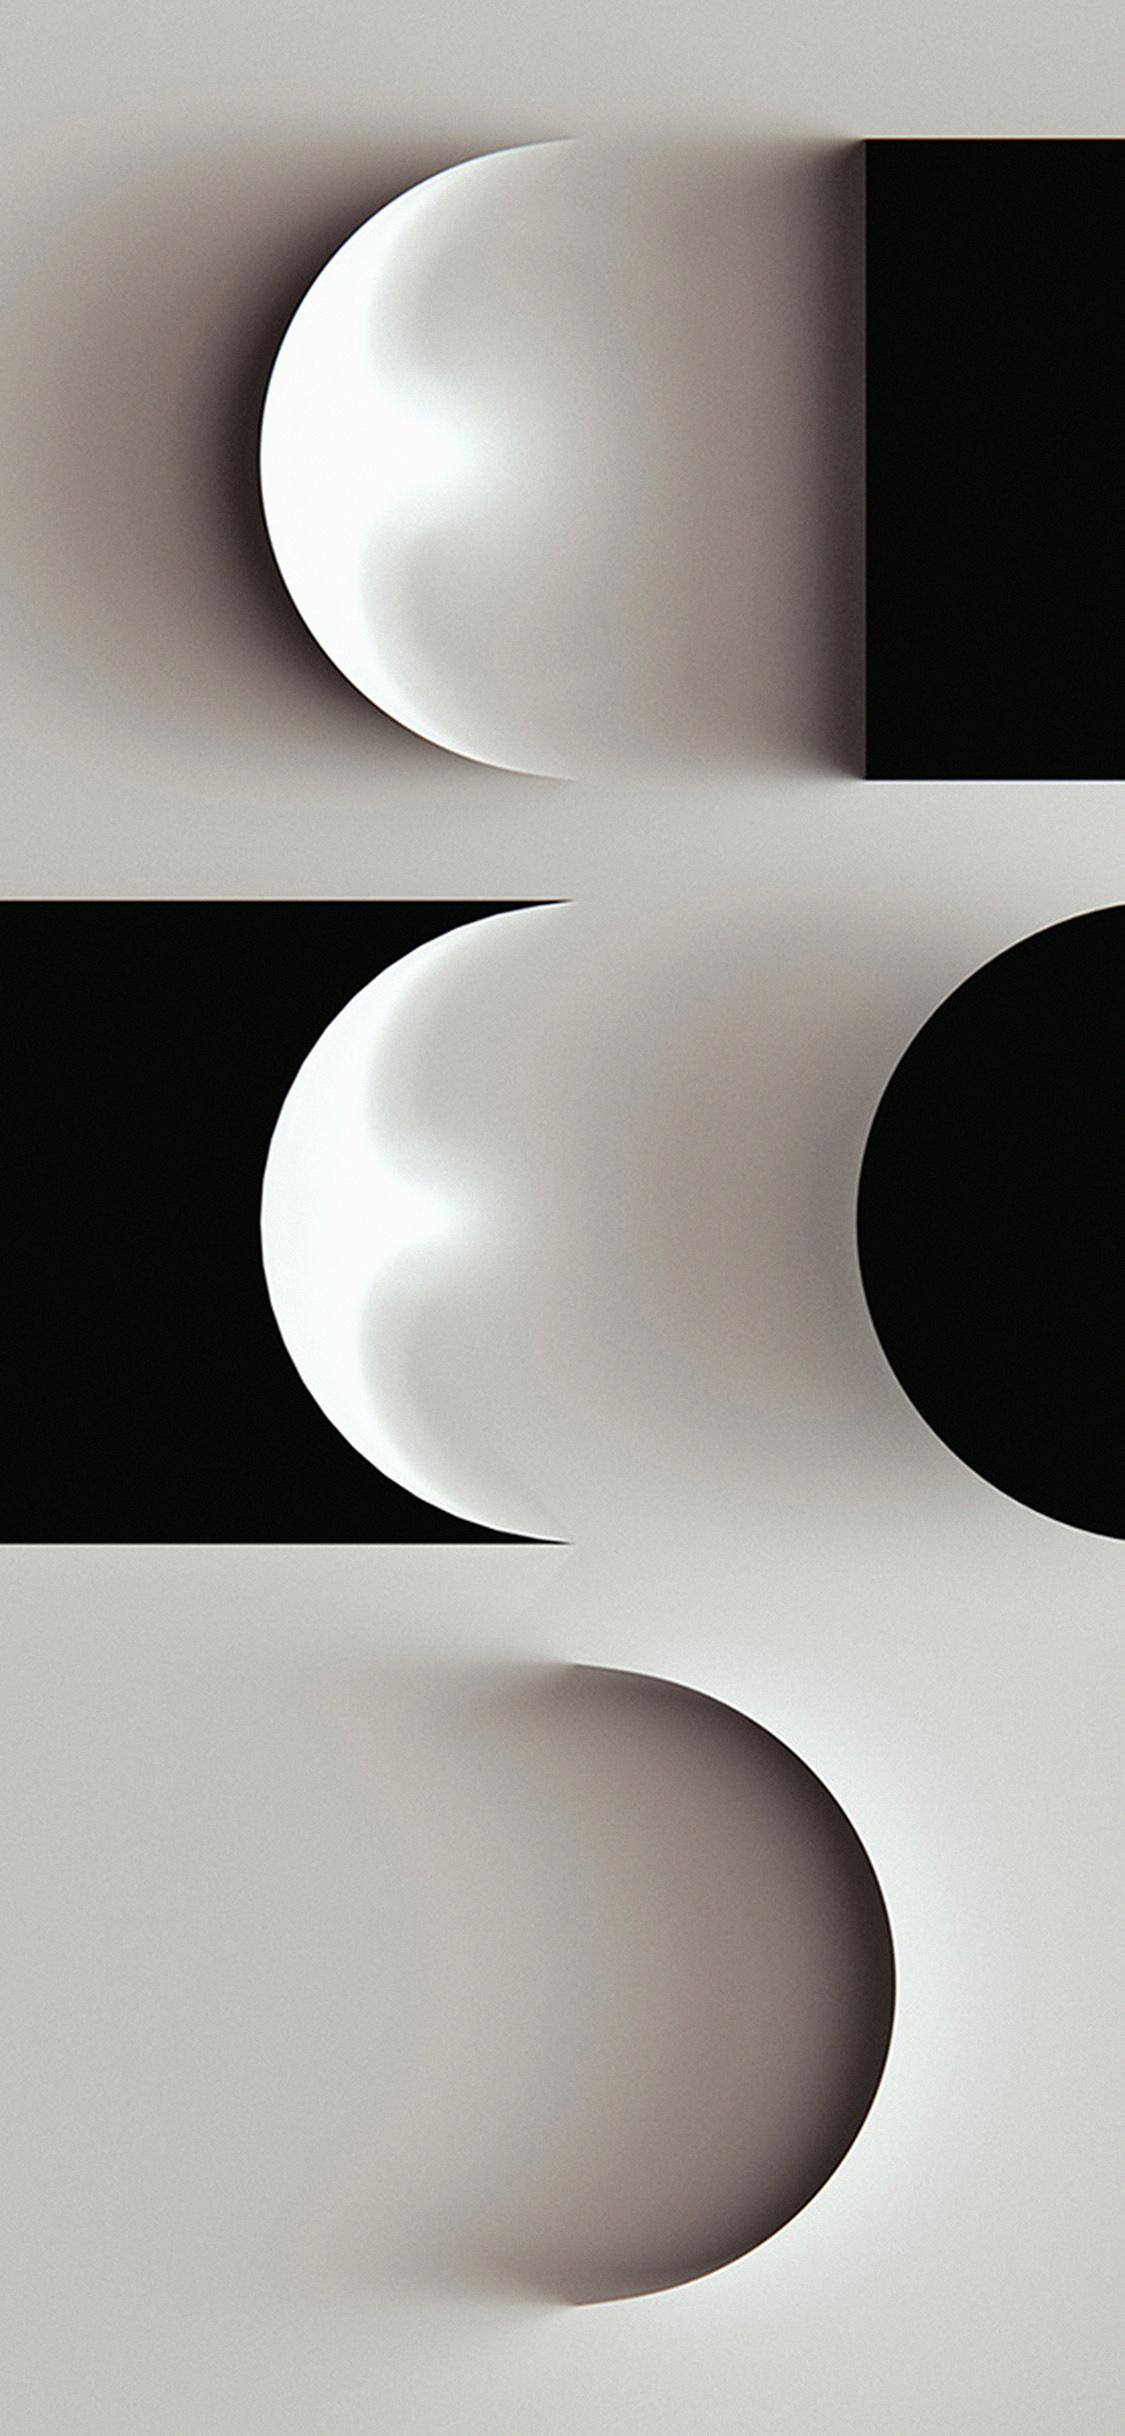 iPhoneXpapers.com-Apple-iPhone-wallpaper-ba35-minimal-circle-square-illustration-art